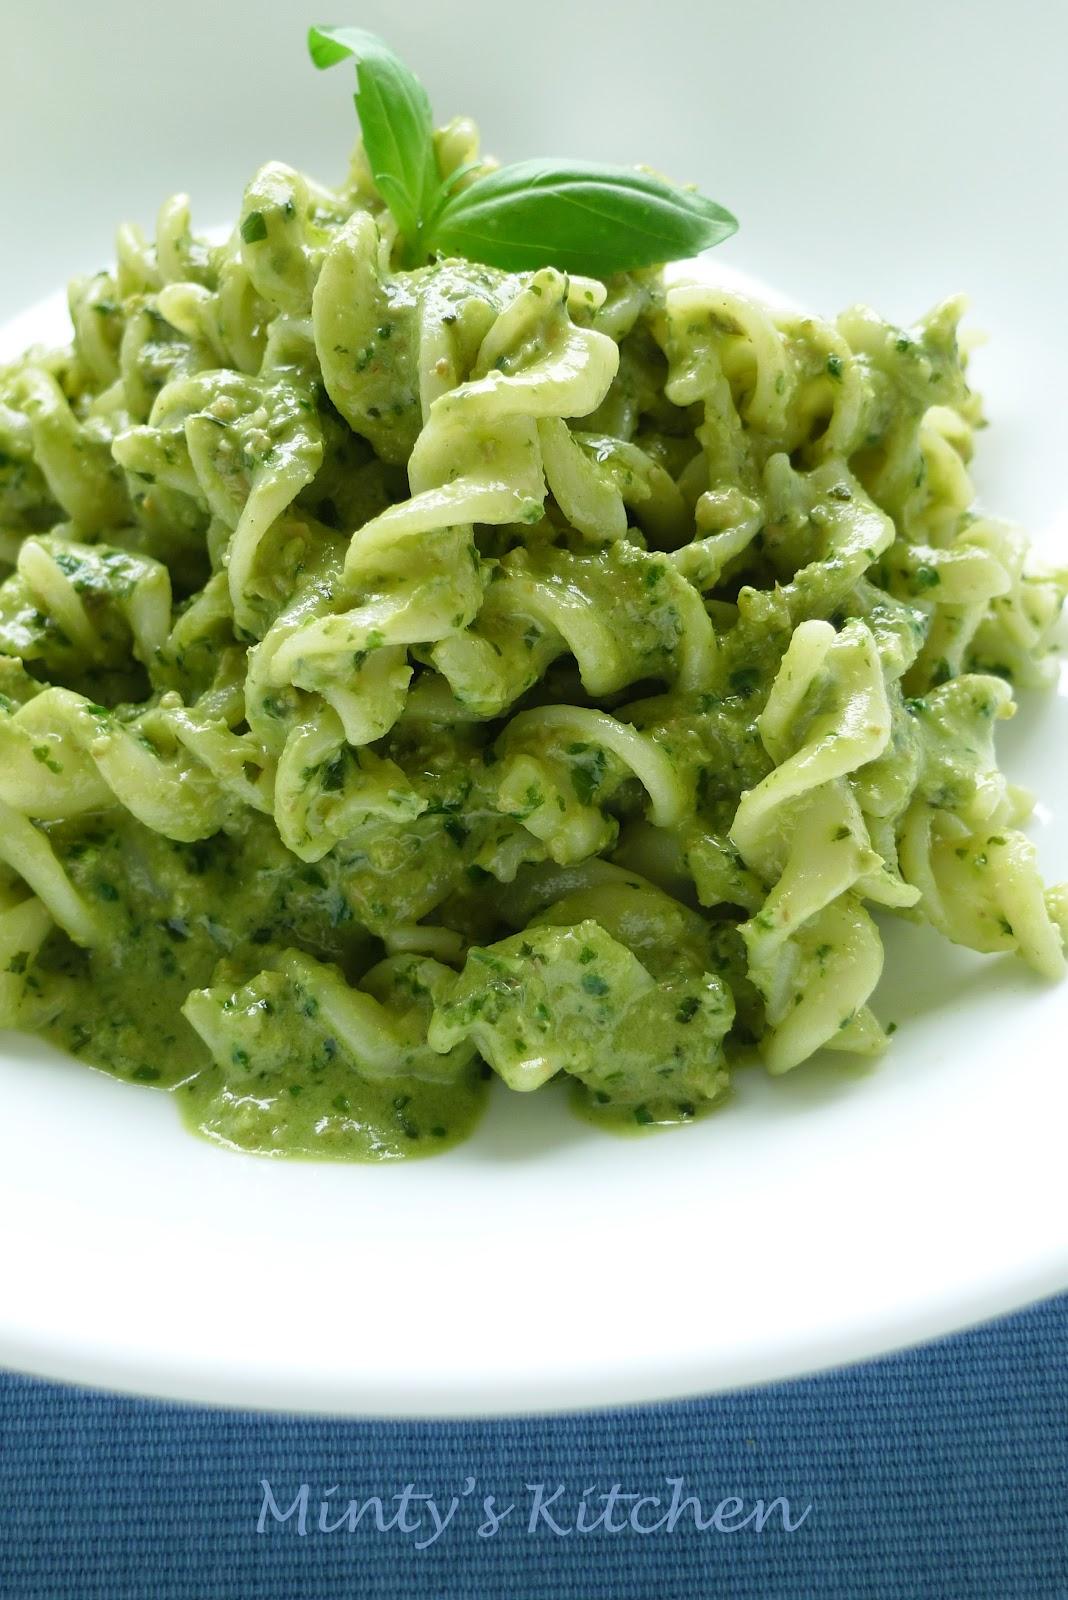 Minty's Kitchen: Basil Pesto Pasta